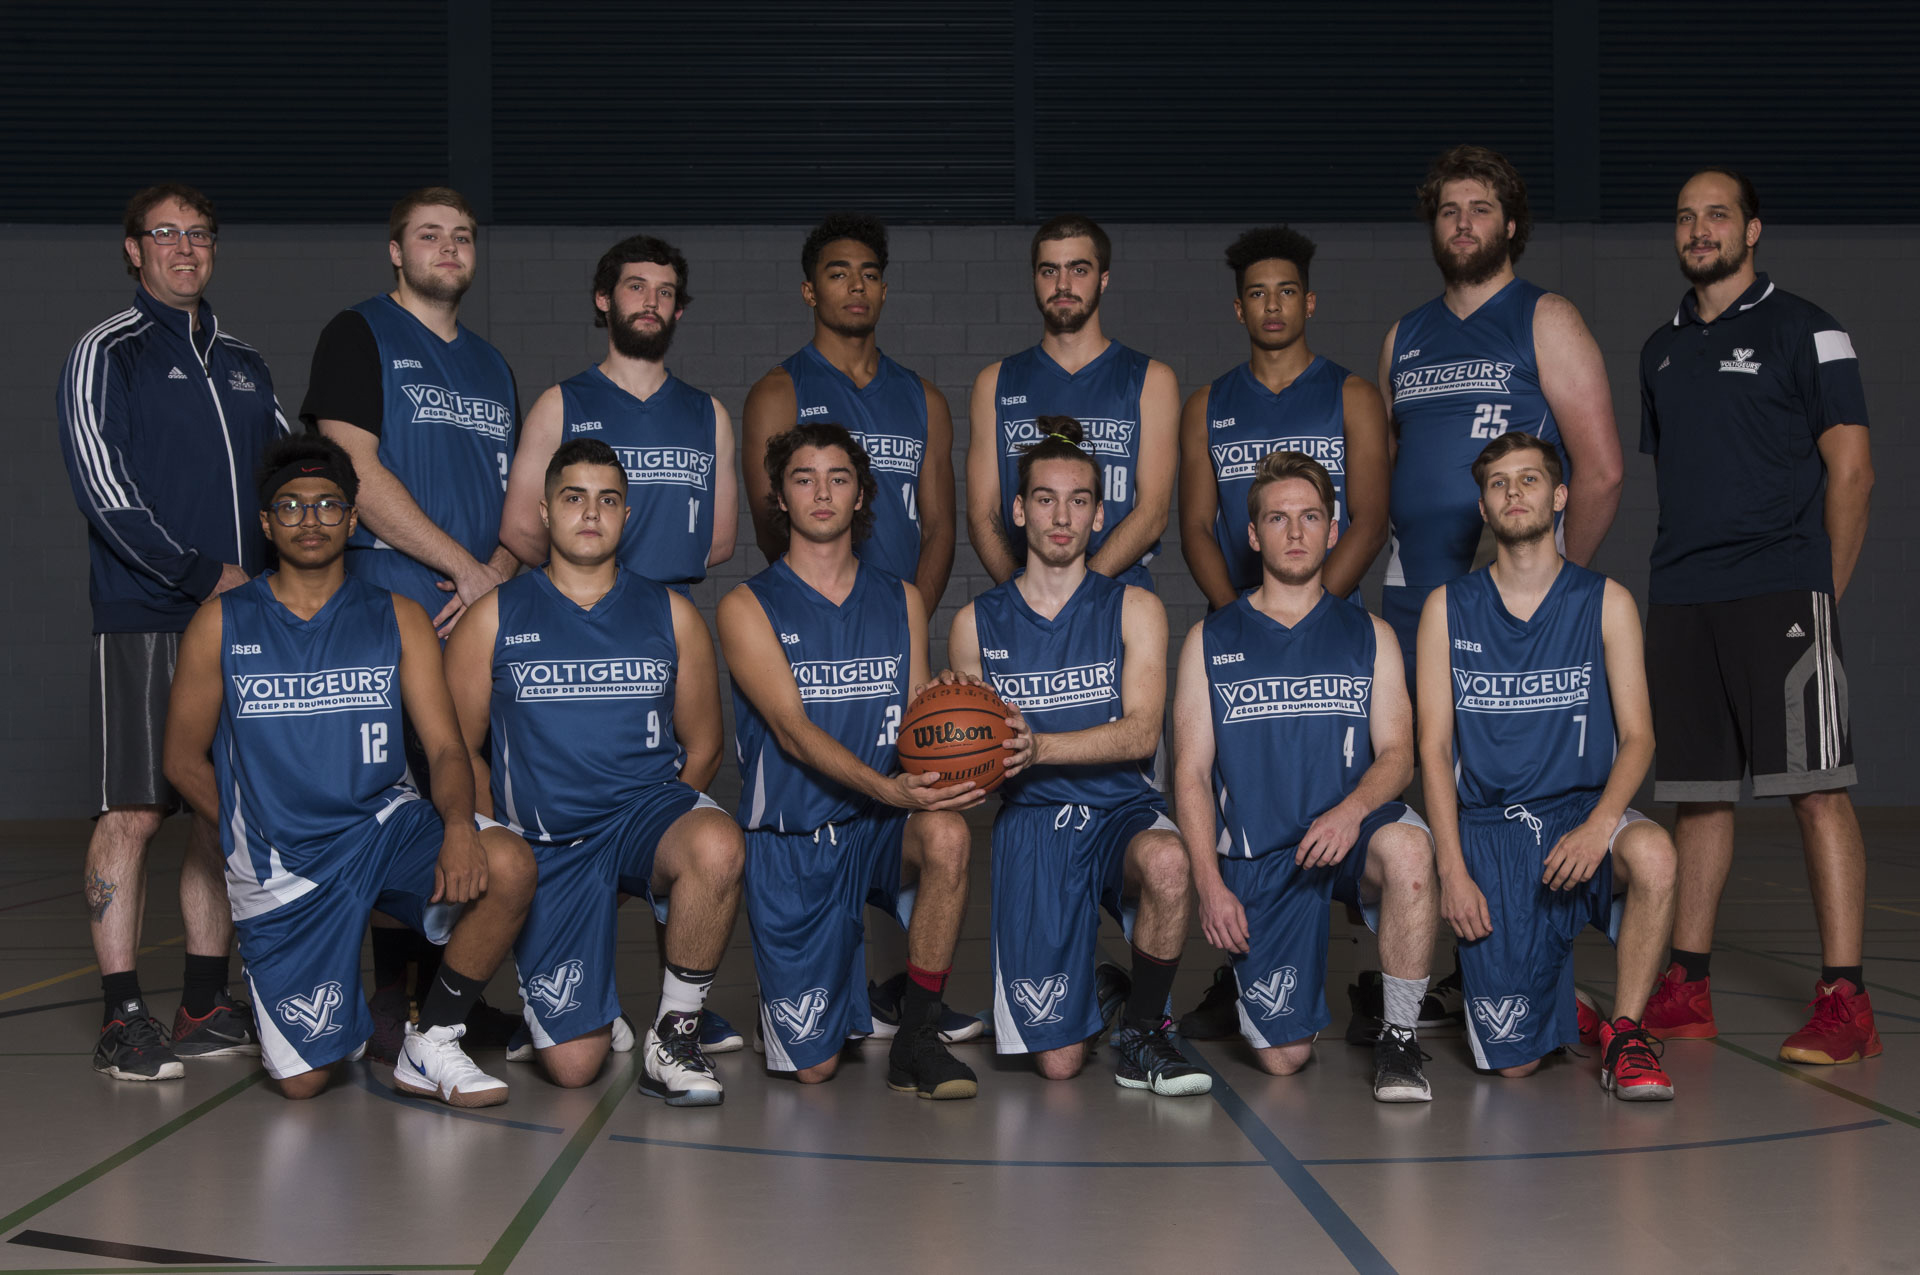 Basketball masculin - Photo équipe